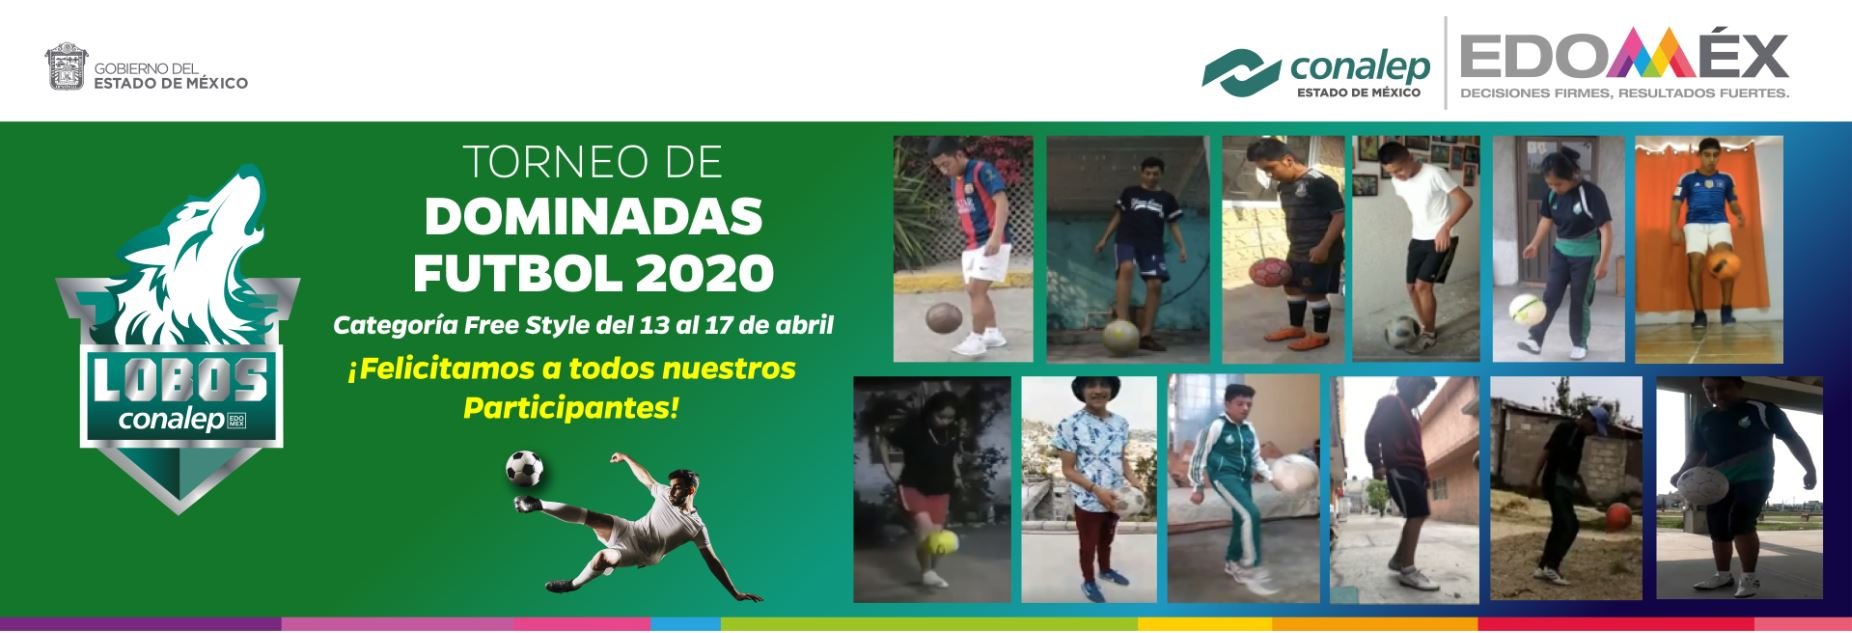 Banner_FelicidadesDominadasFutbol2020